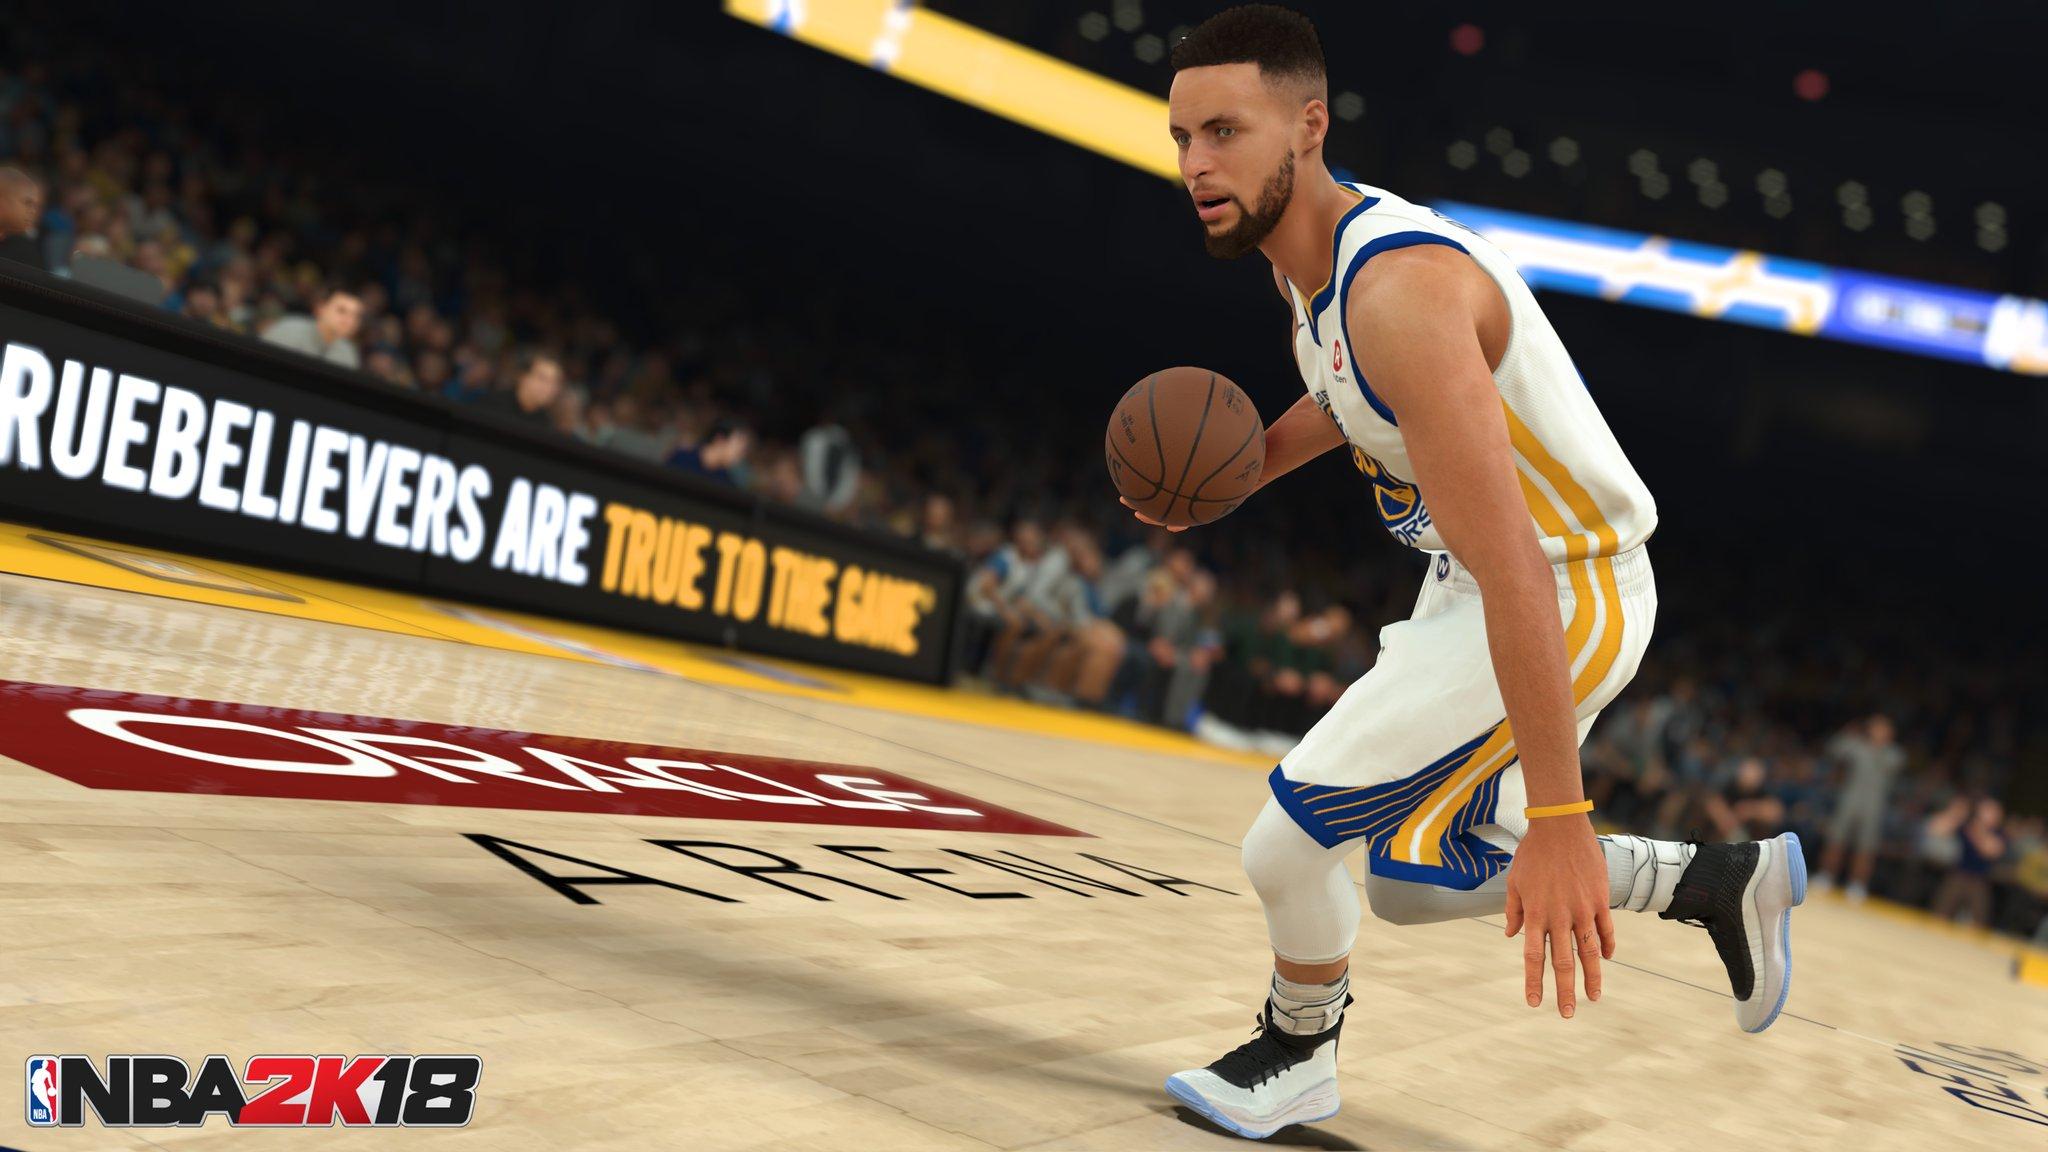 NBA 2K18 LOCKER CODES